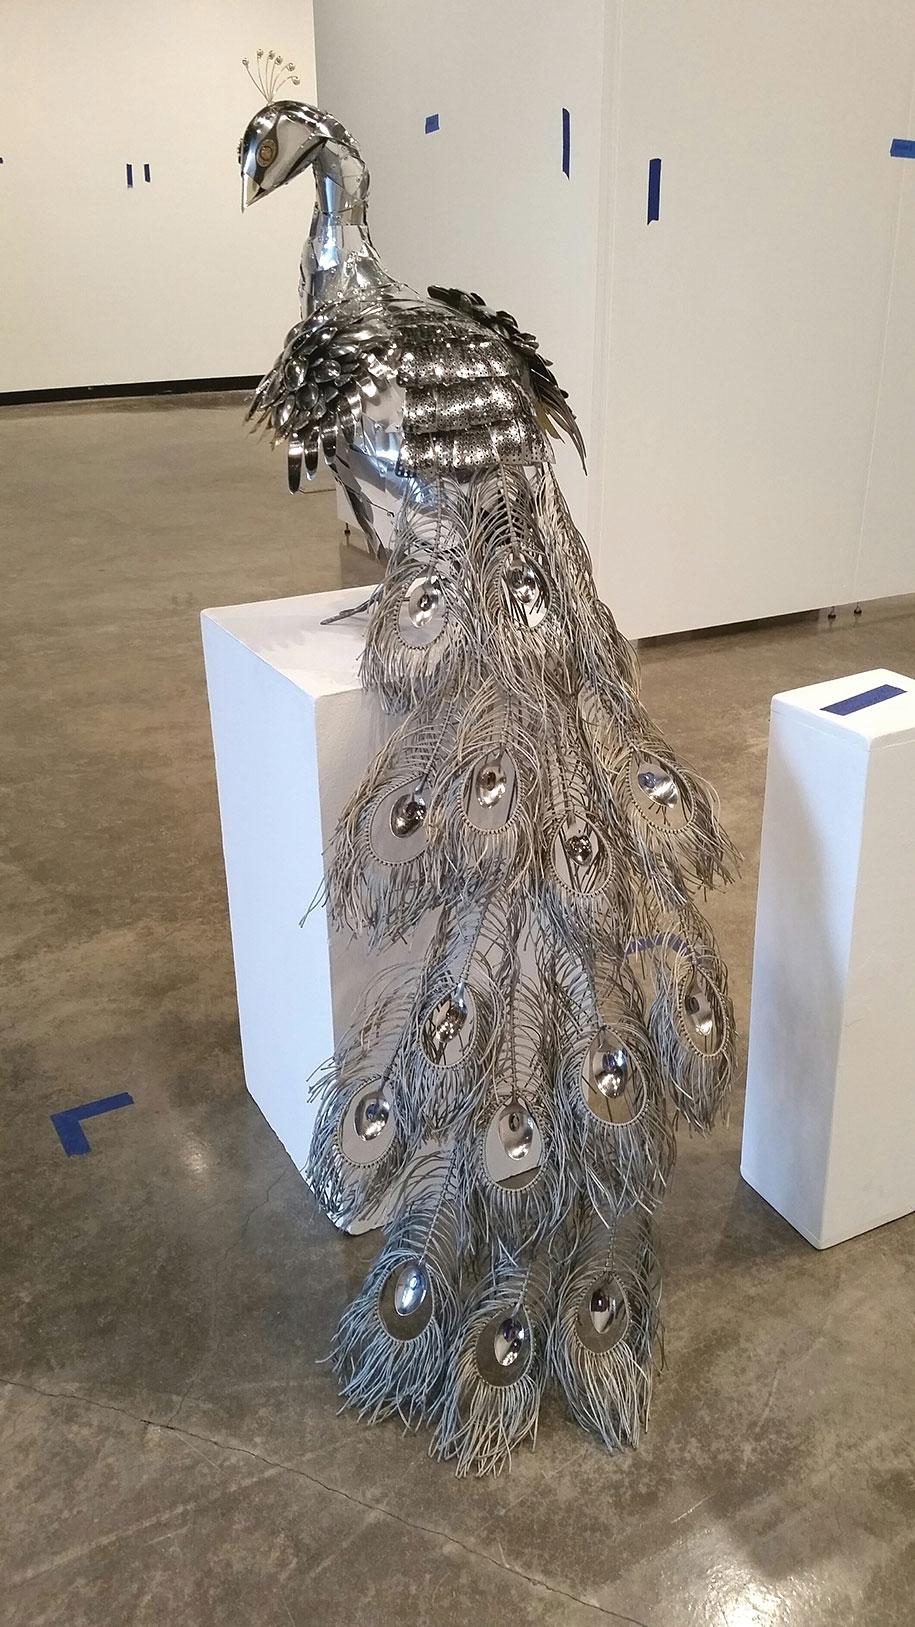 found-object-sculpture-metal-peacock-liddlenomnom-12